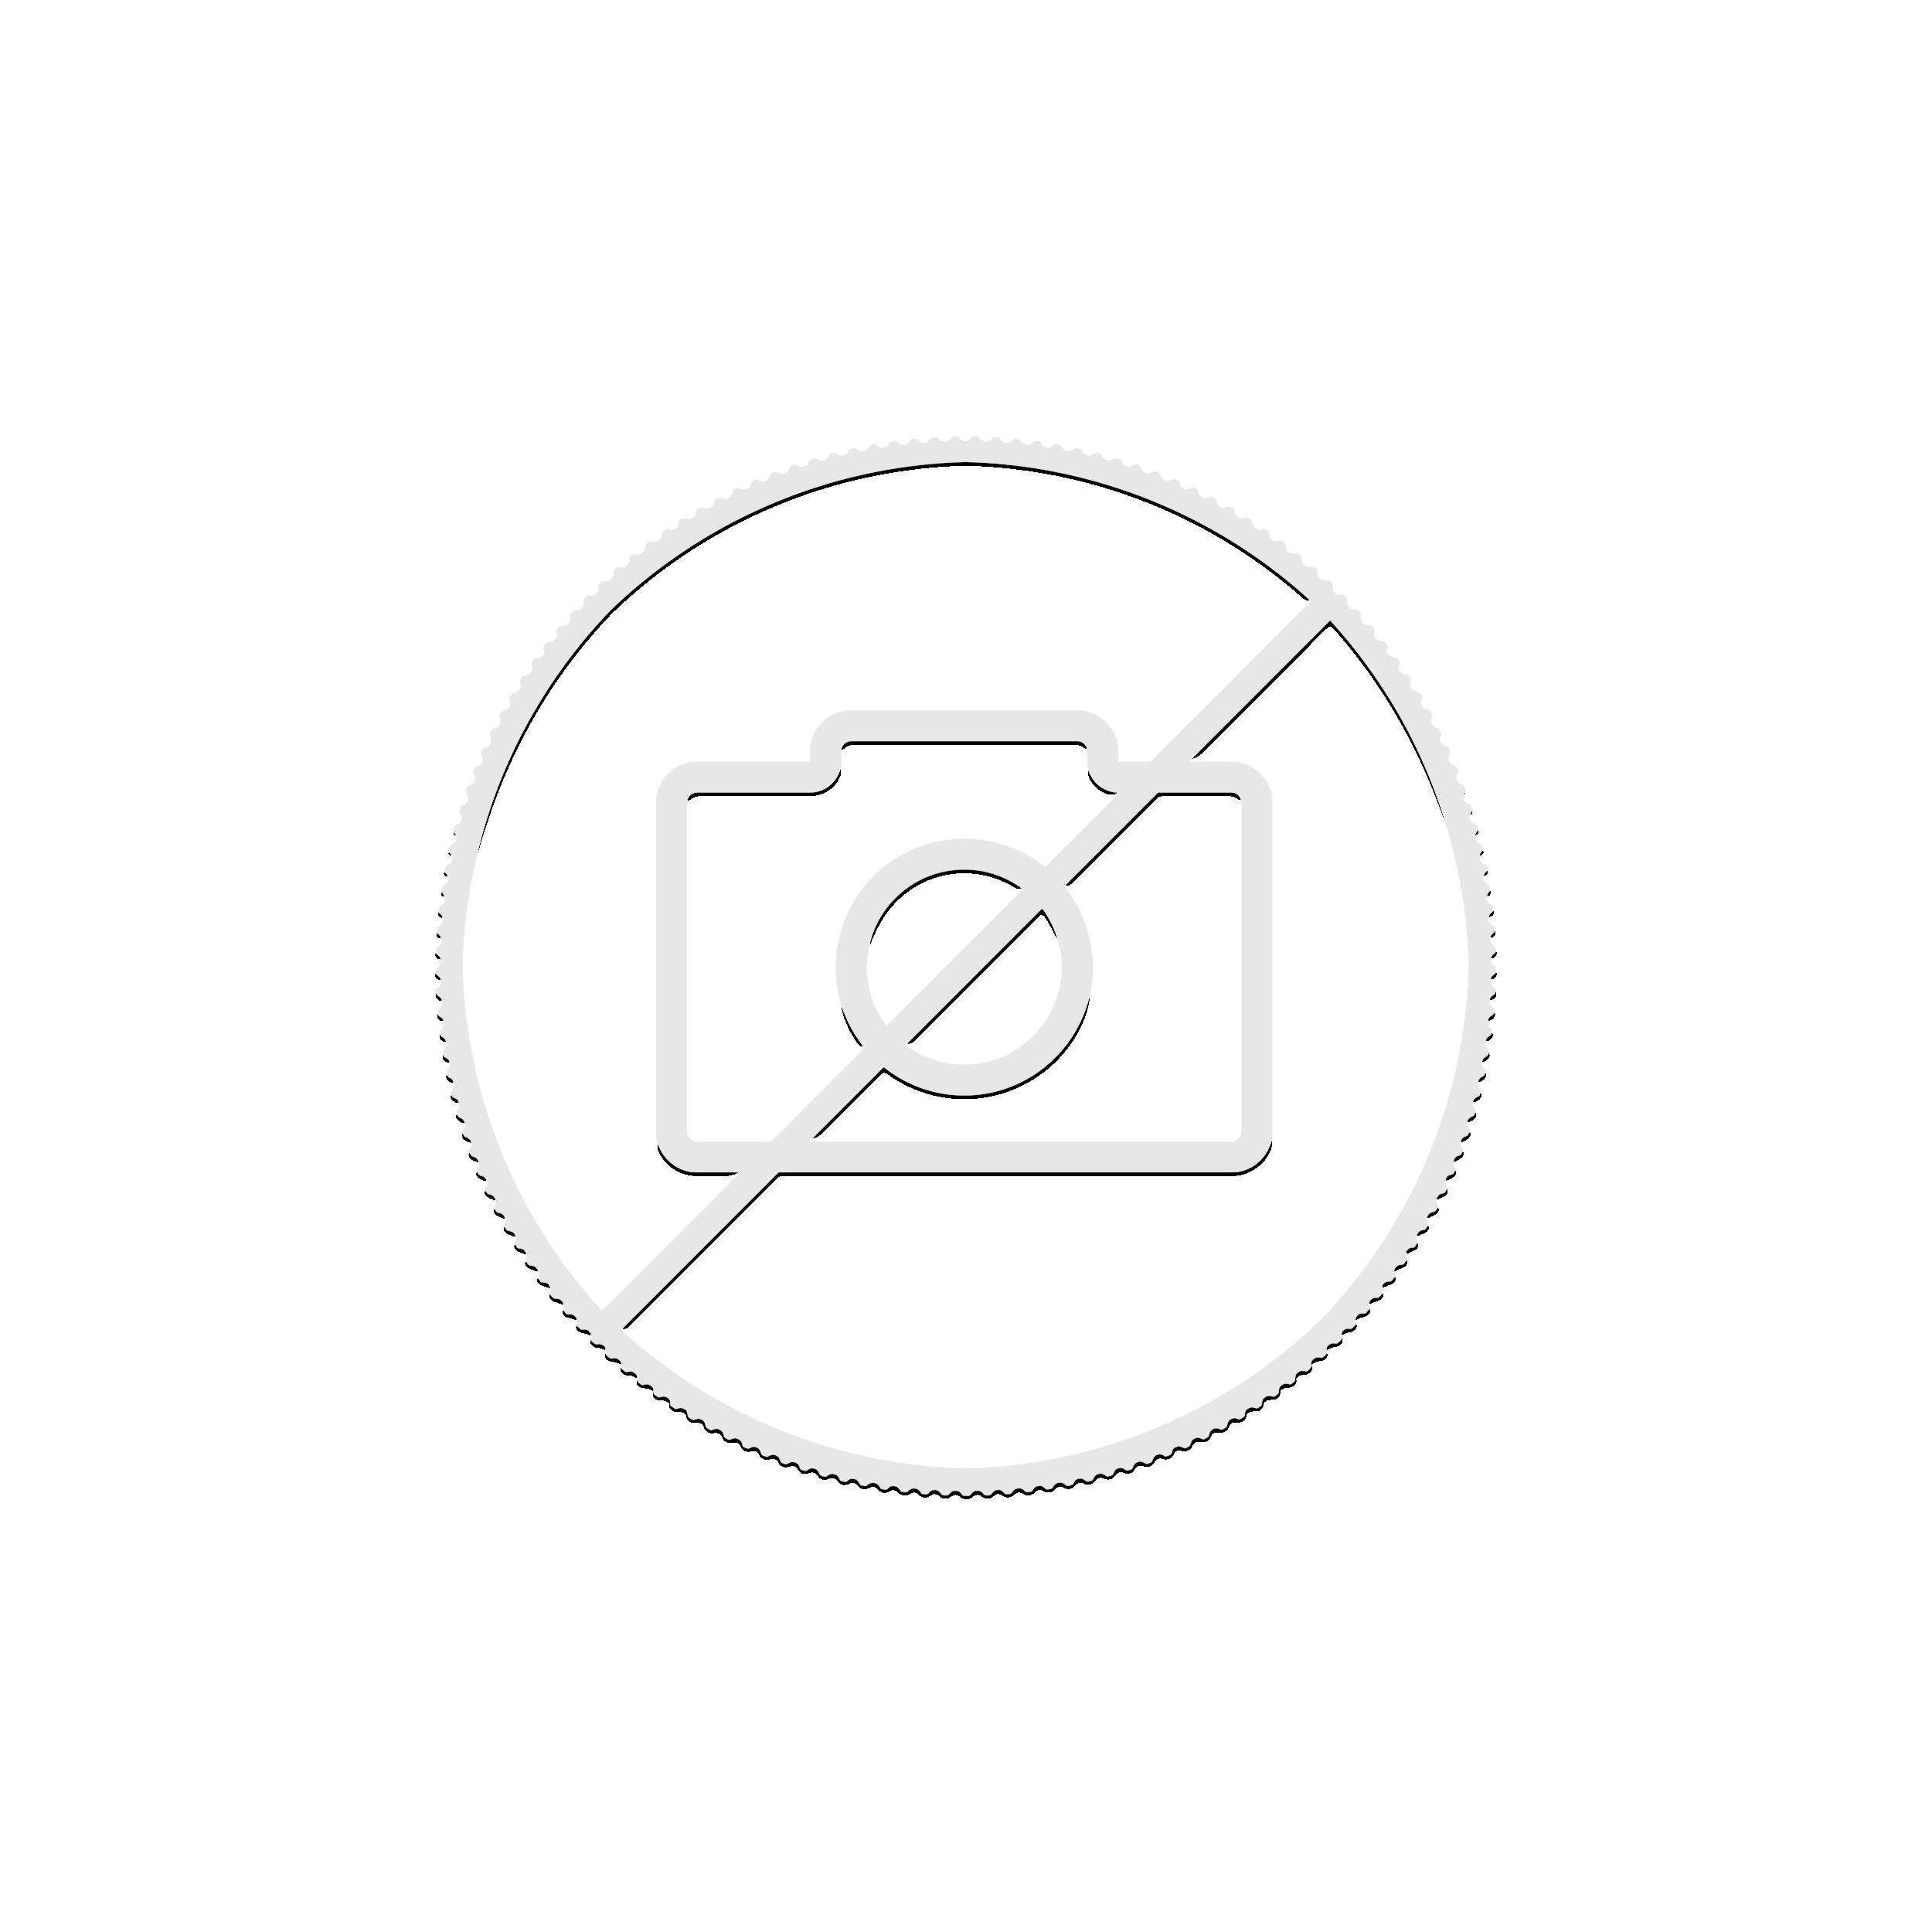 1 troy ounce zilveren munt Holy Trinity Botticelli